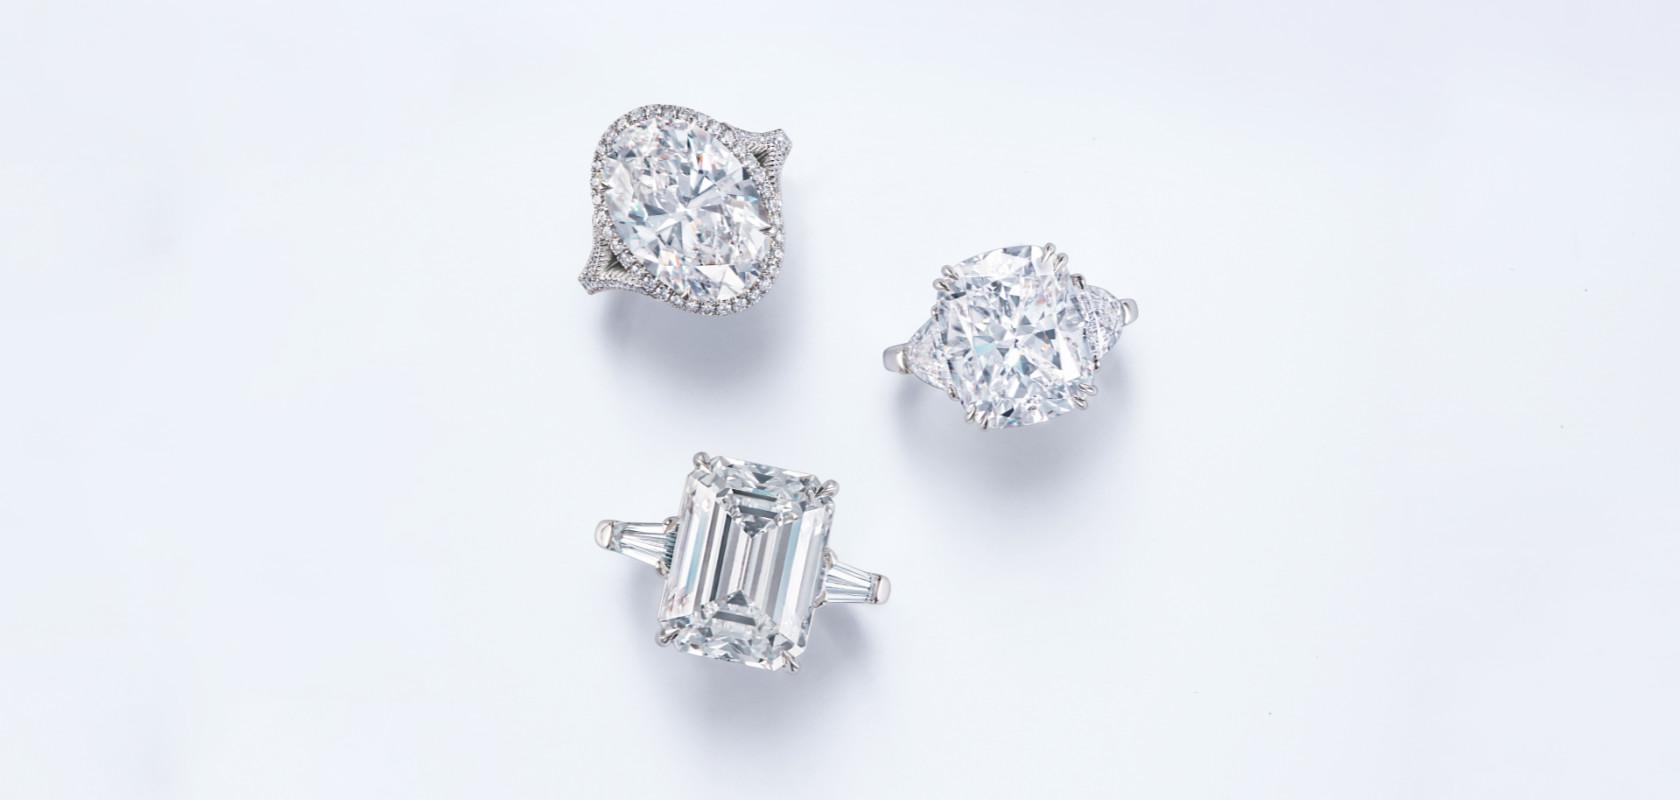 Diamond Education, what are the 4Cs of diamonds